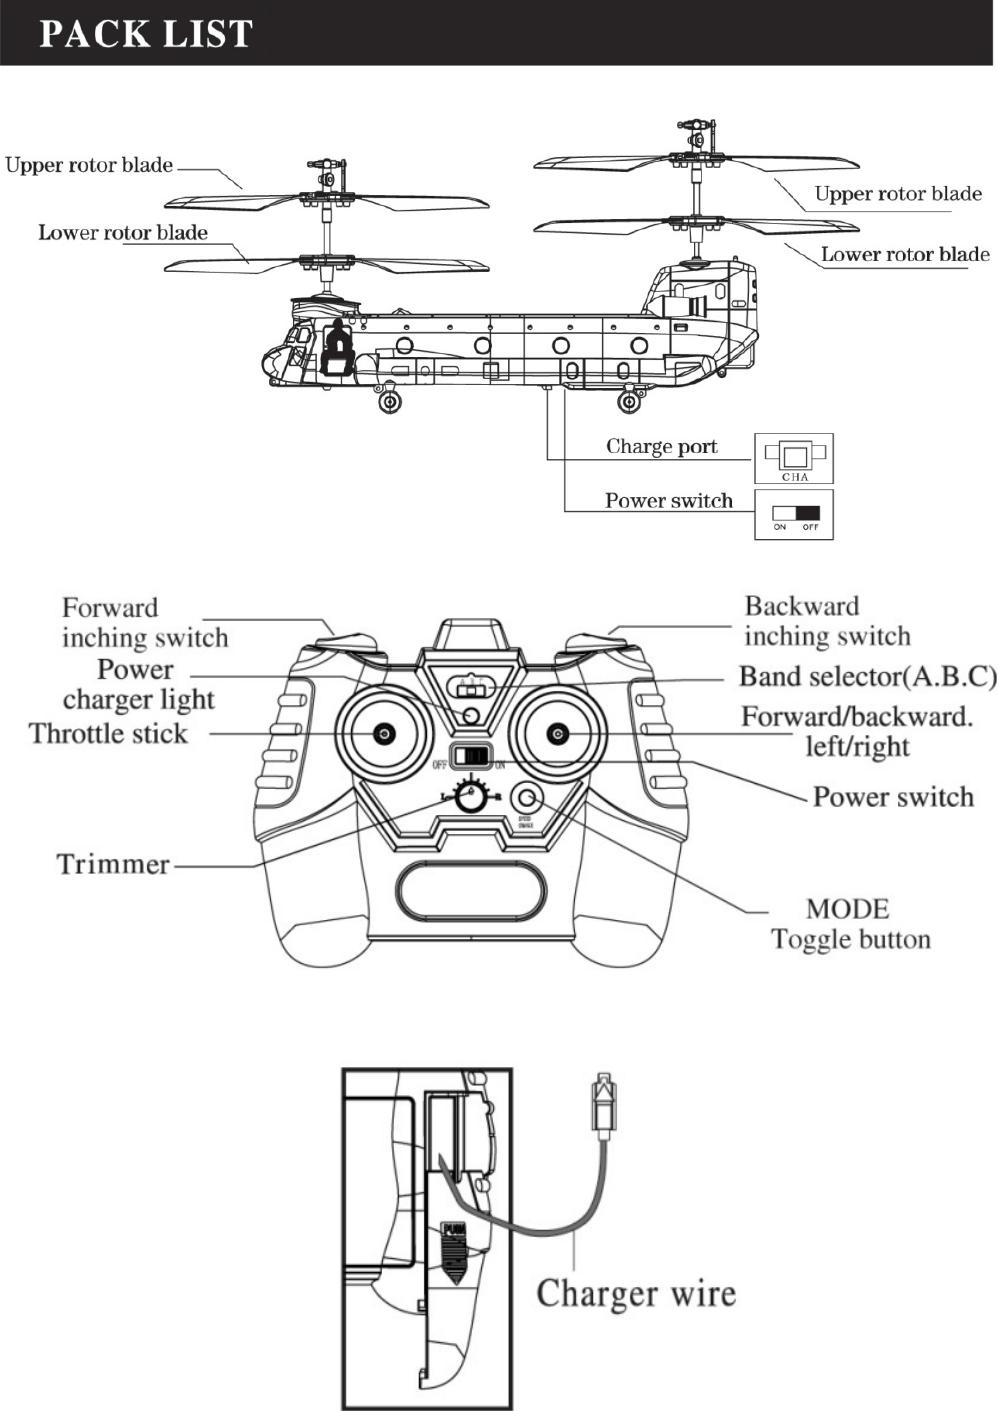 medium resolution of page 2 of 5 kahelchnoka kogan chinook transporter helicopter user manual kahelchnoka a